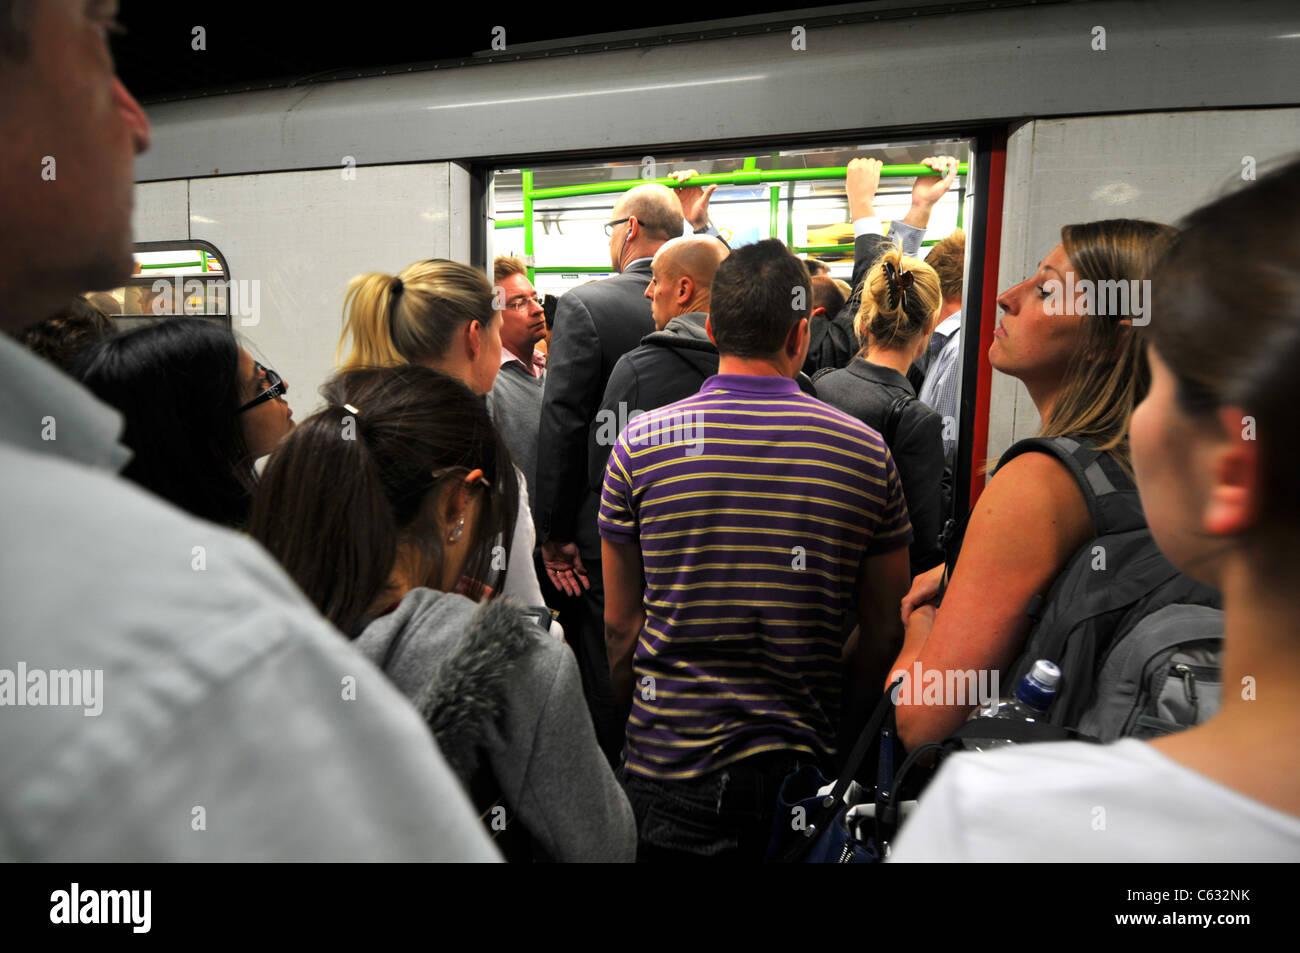 Rush hour, London underground, South Kensington tube station, London, Britain, UK - Stock Image